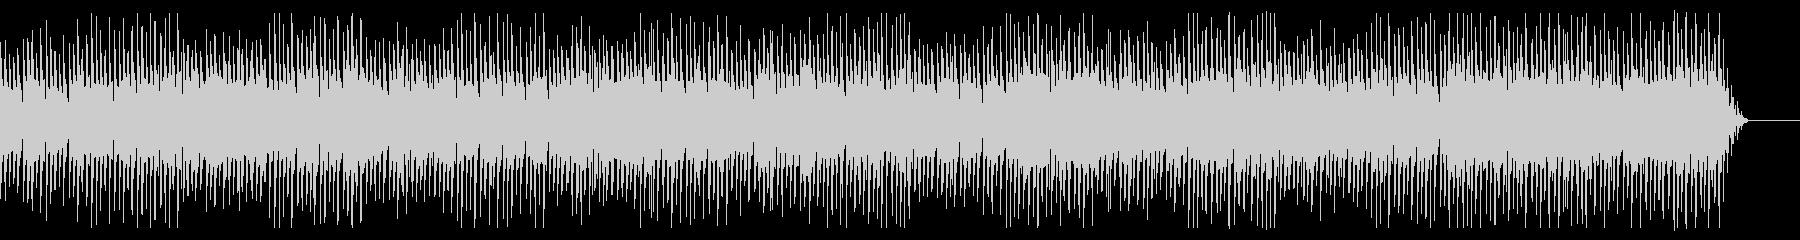 Zen ソルフェジオ周波数 528Hzの未再生の波形